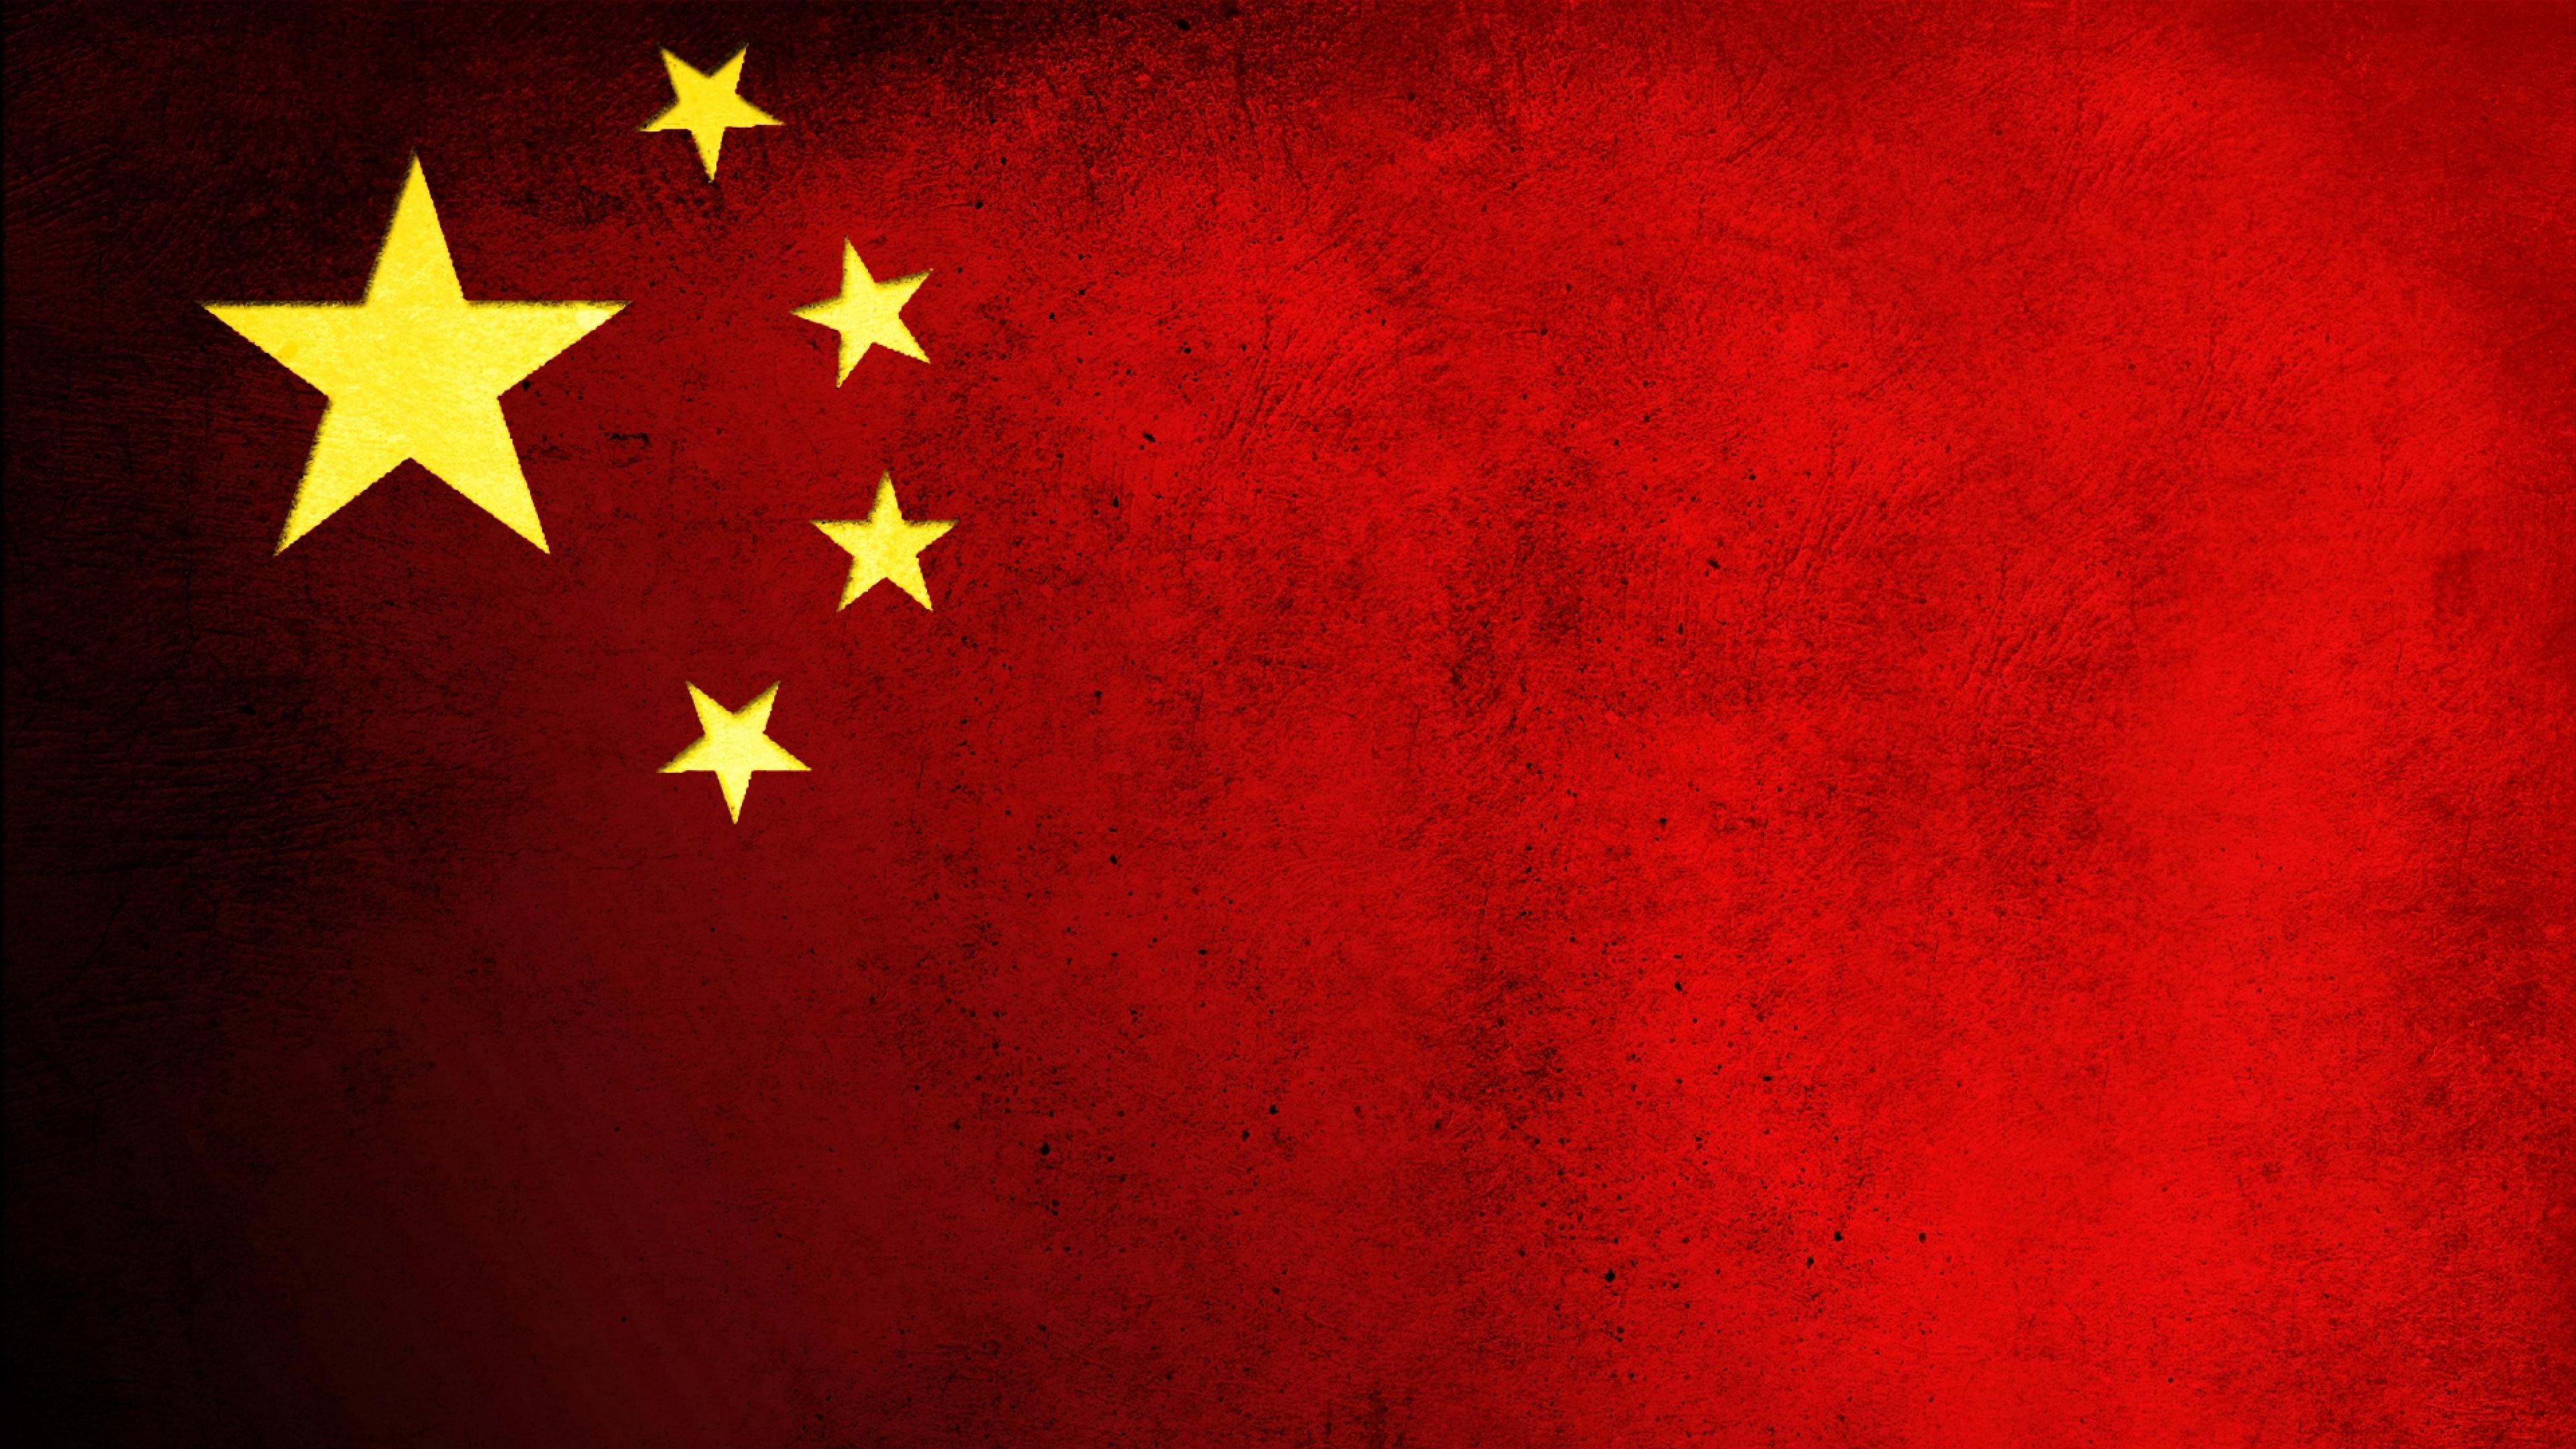 Beijing At Night China Mac Wallpapers Download Desktop Background | 2160x3840